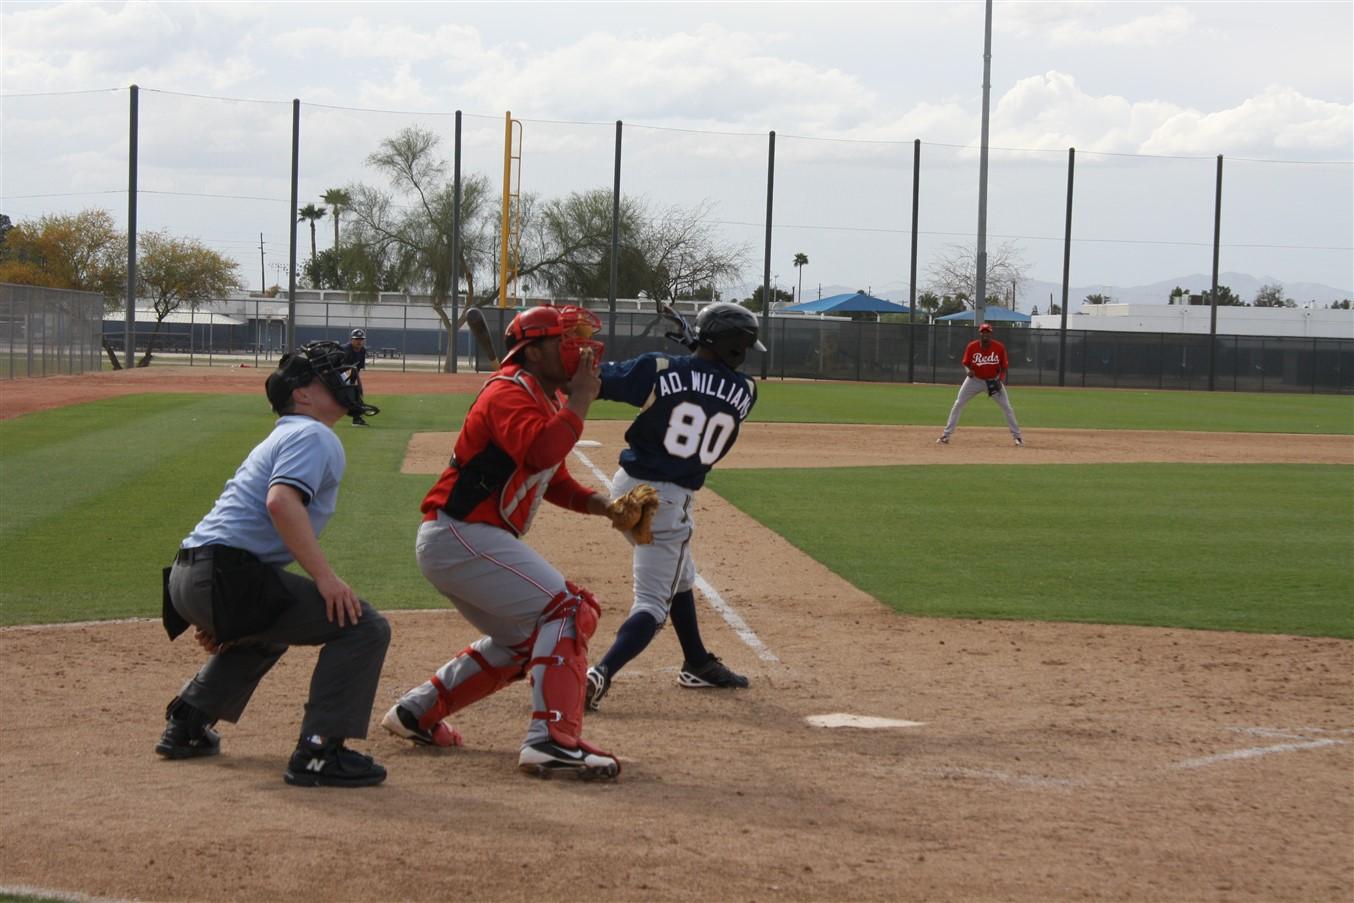 2012 03 17 89 Phoenix Maryville Baseball Complex Spring Training.jpg